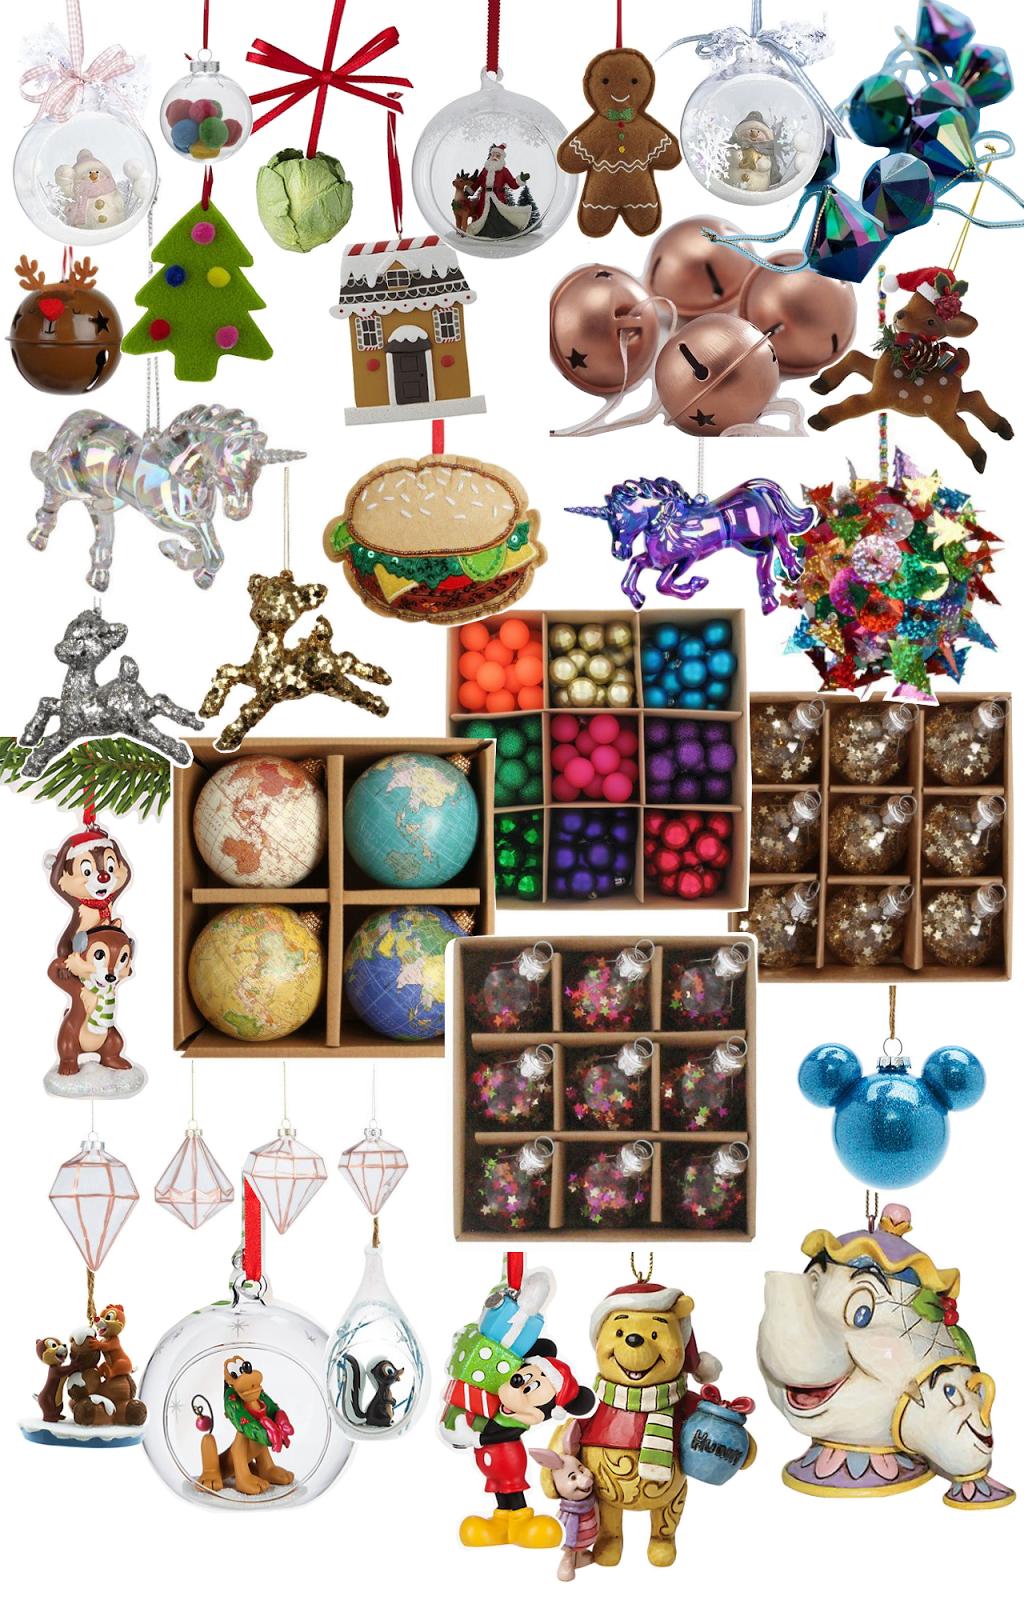 Christmas, Decoration, Wishlist, Paperchase, Disney Store, Tesco Direct,